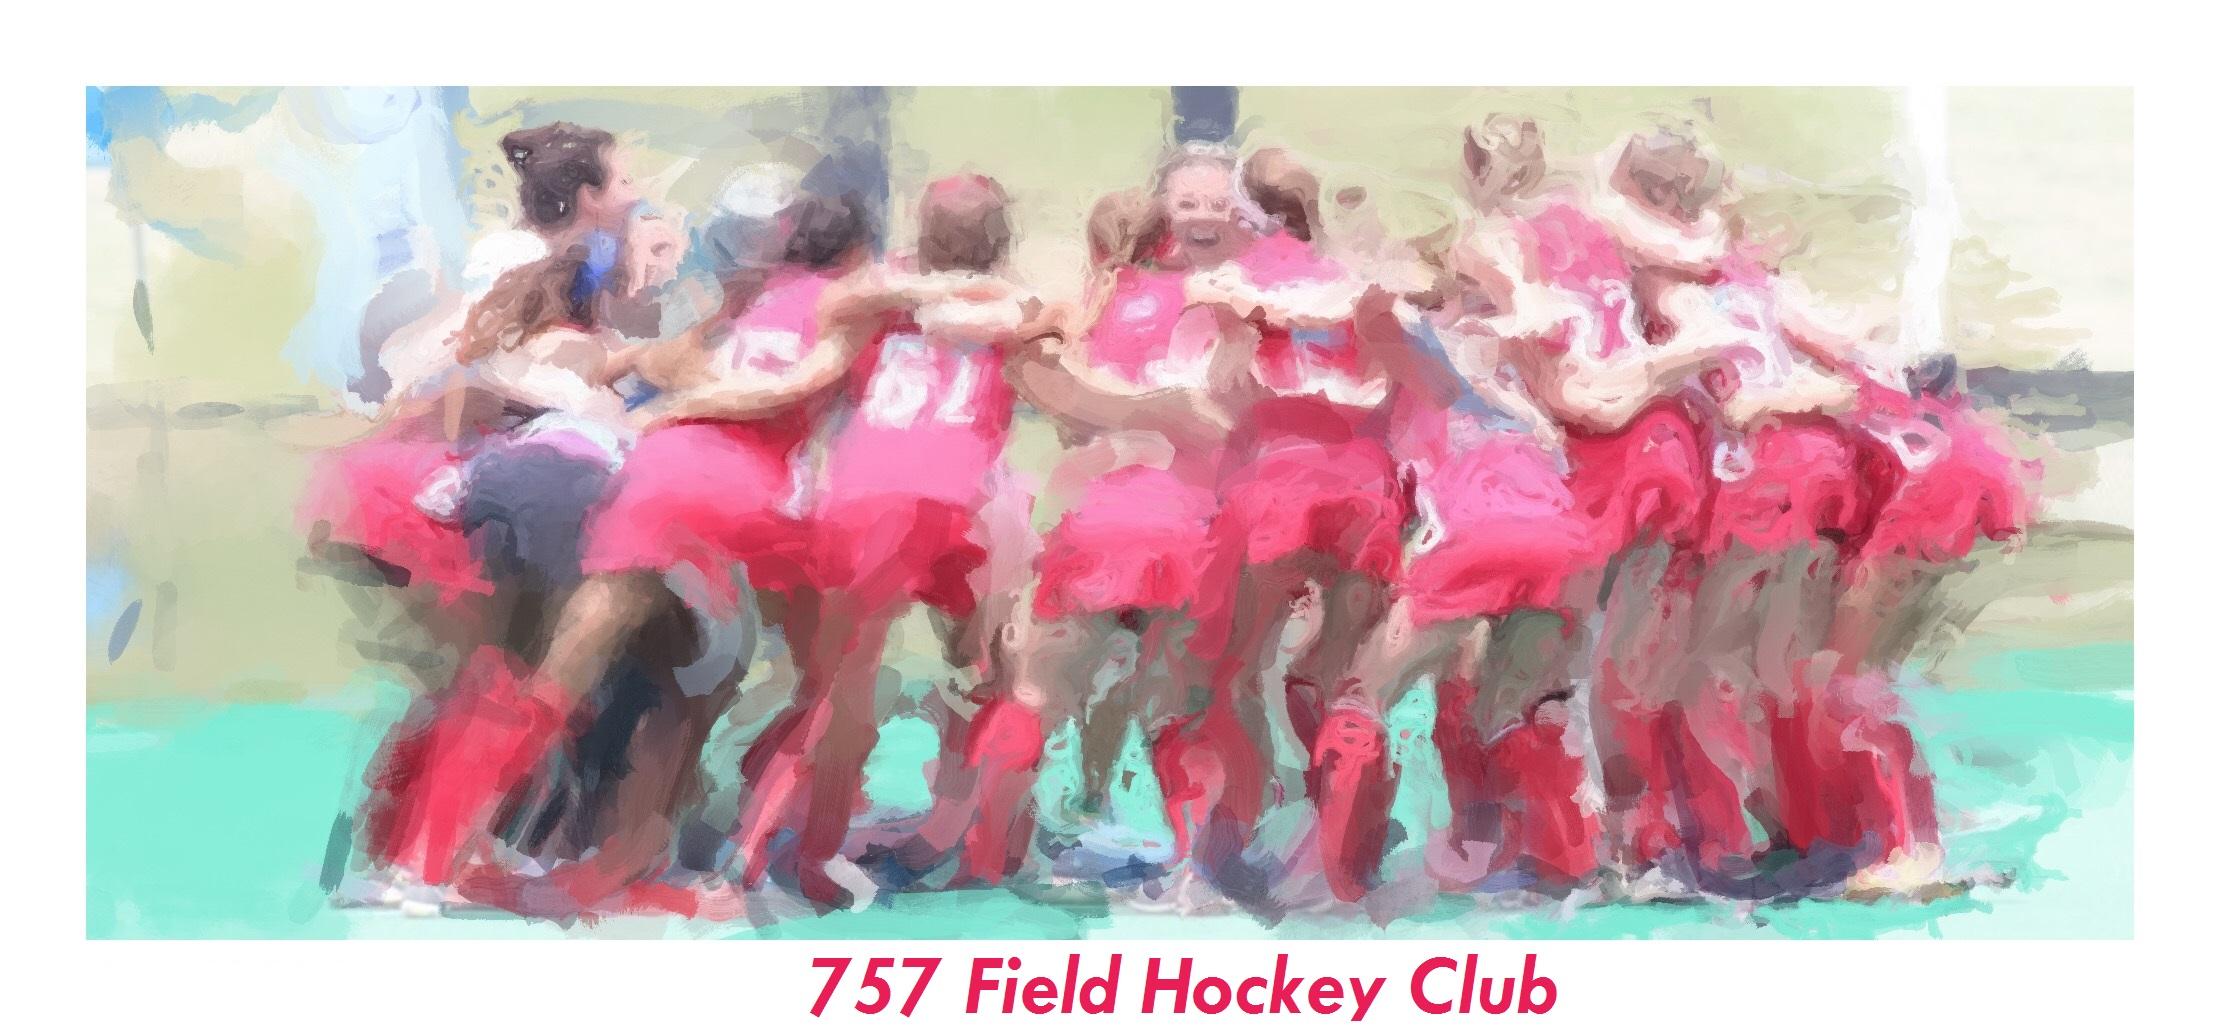 757 Field Hockey Club, Field Hockey, Goal, Field